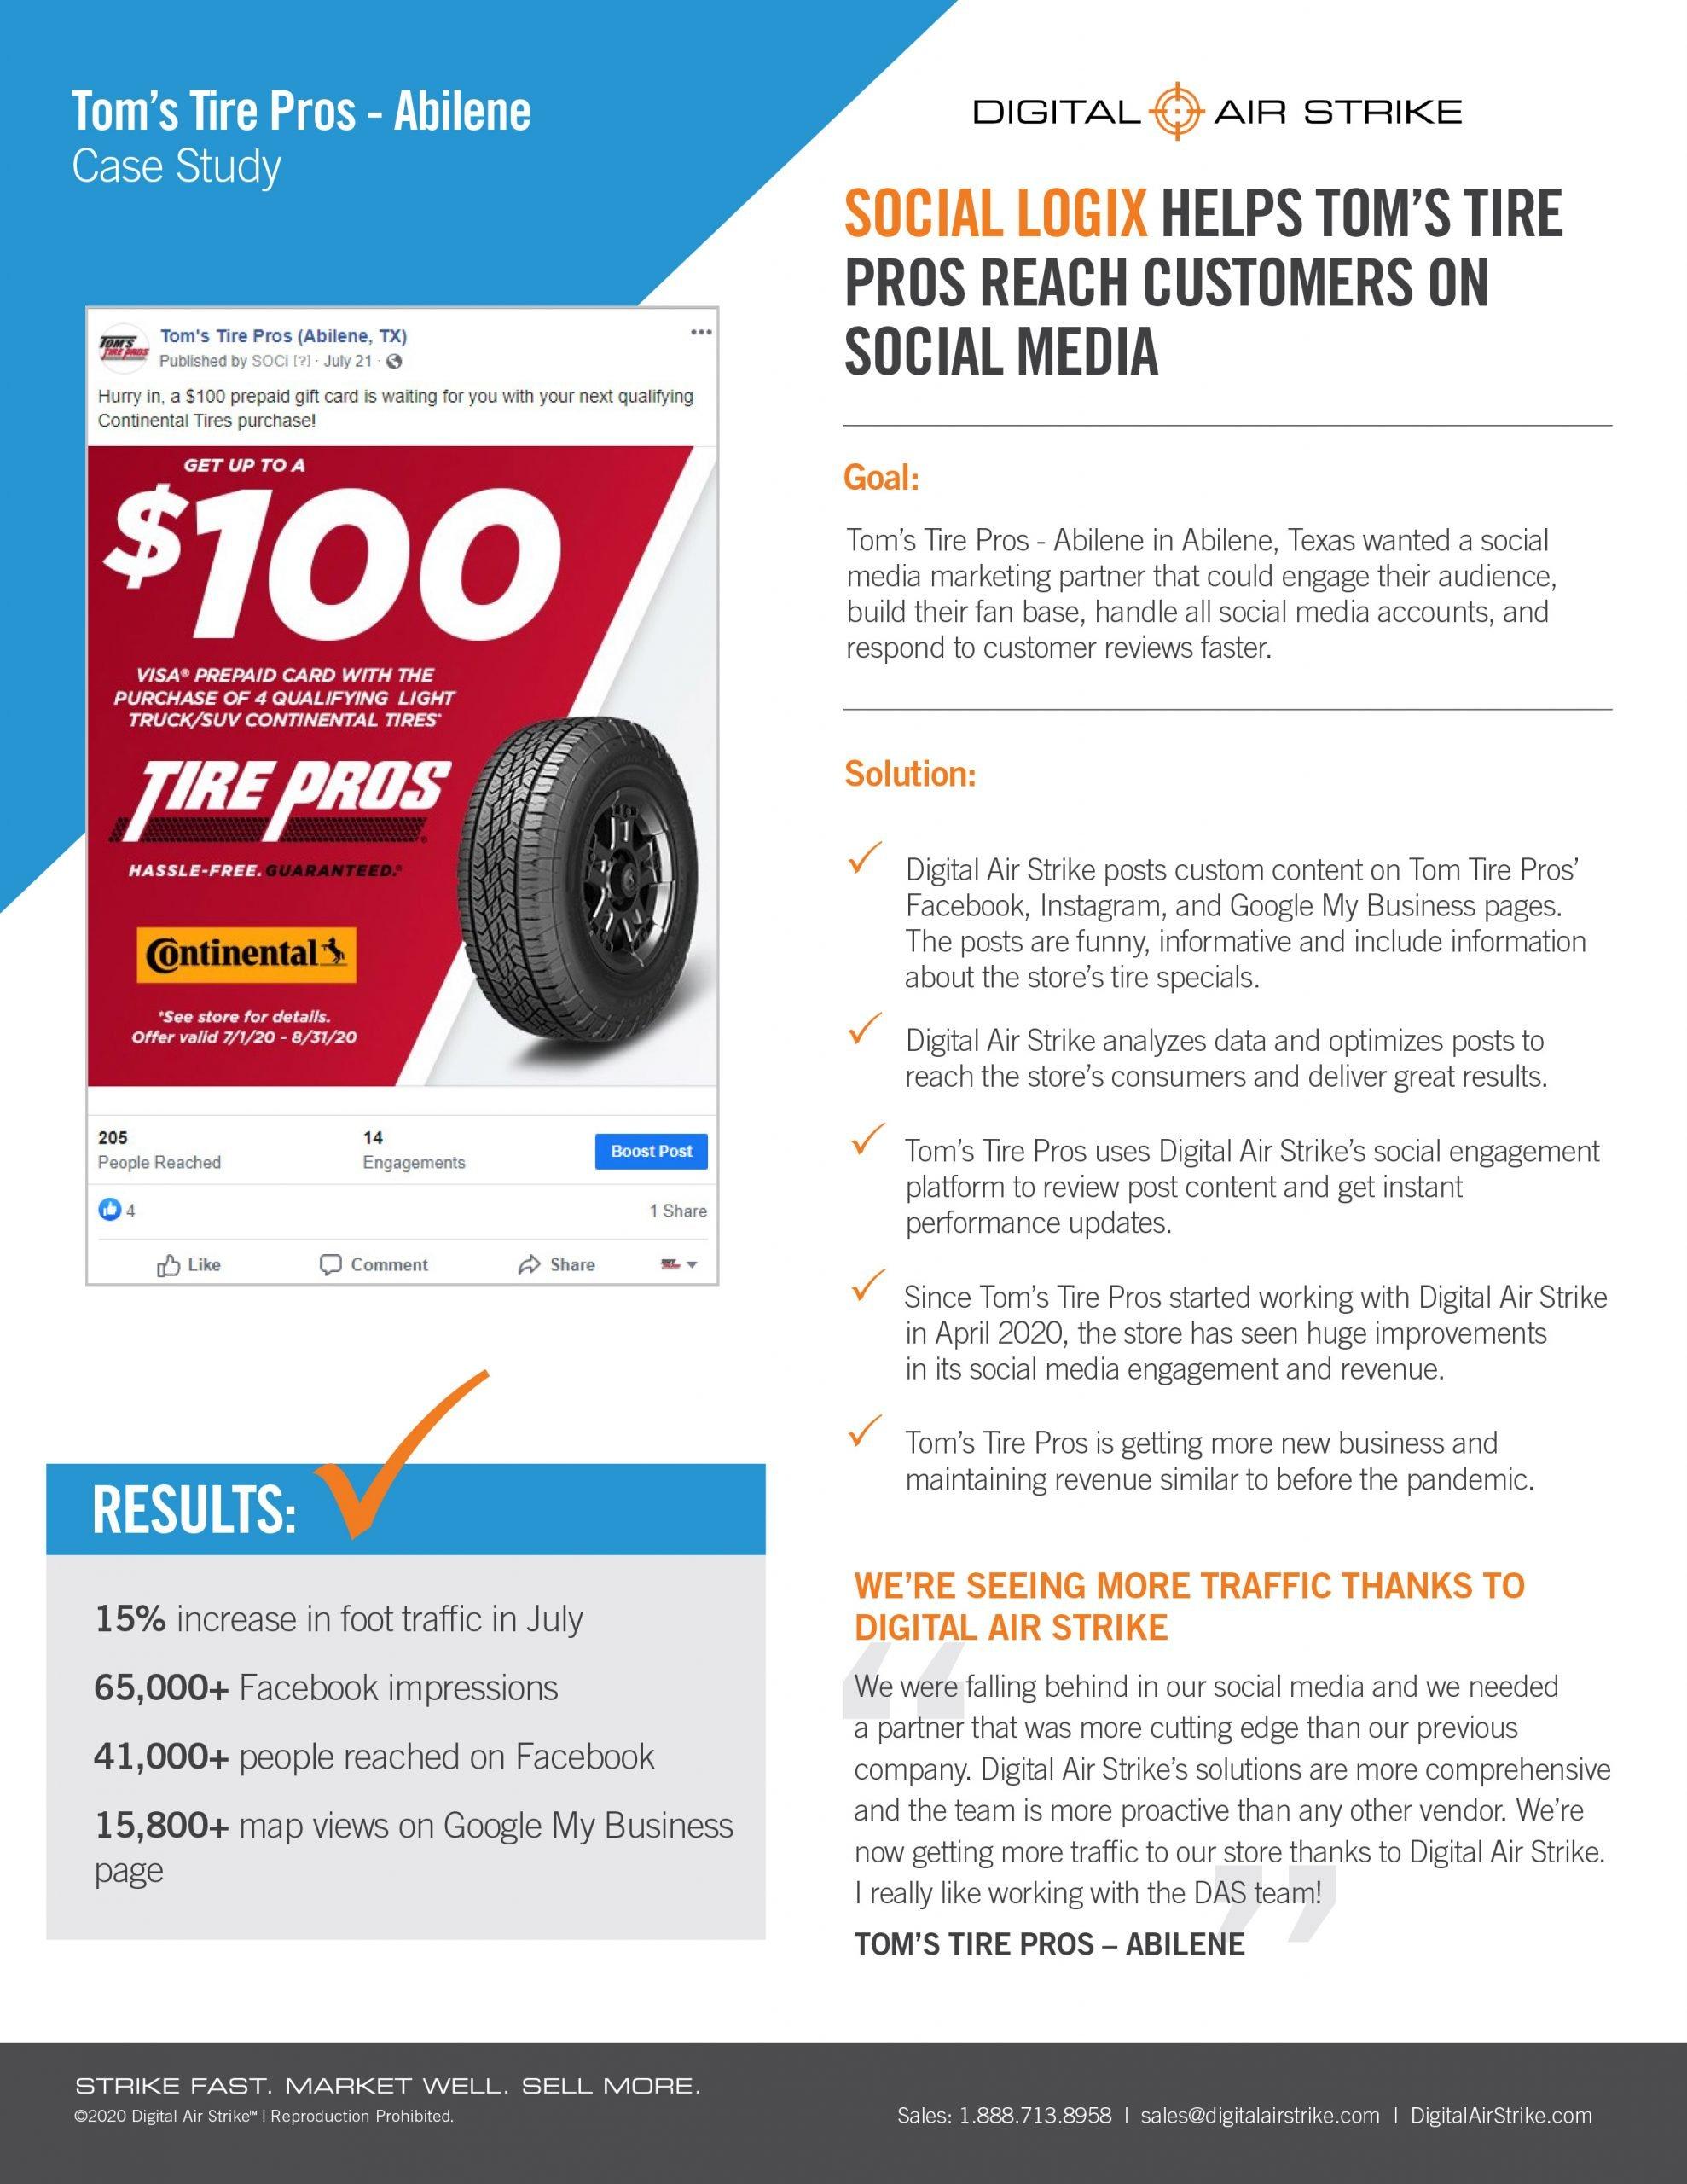 Social Media and Reputation Management Helps Tire Shop Increase Sales – Digital Air Strike